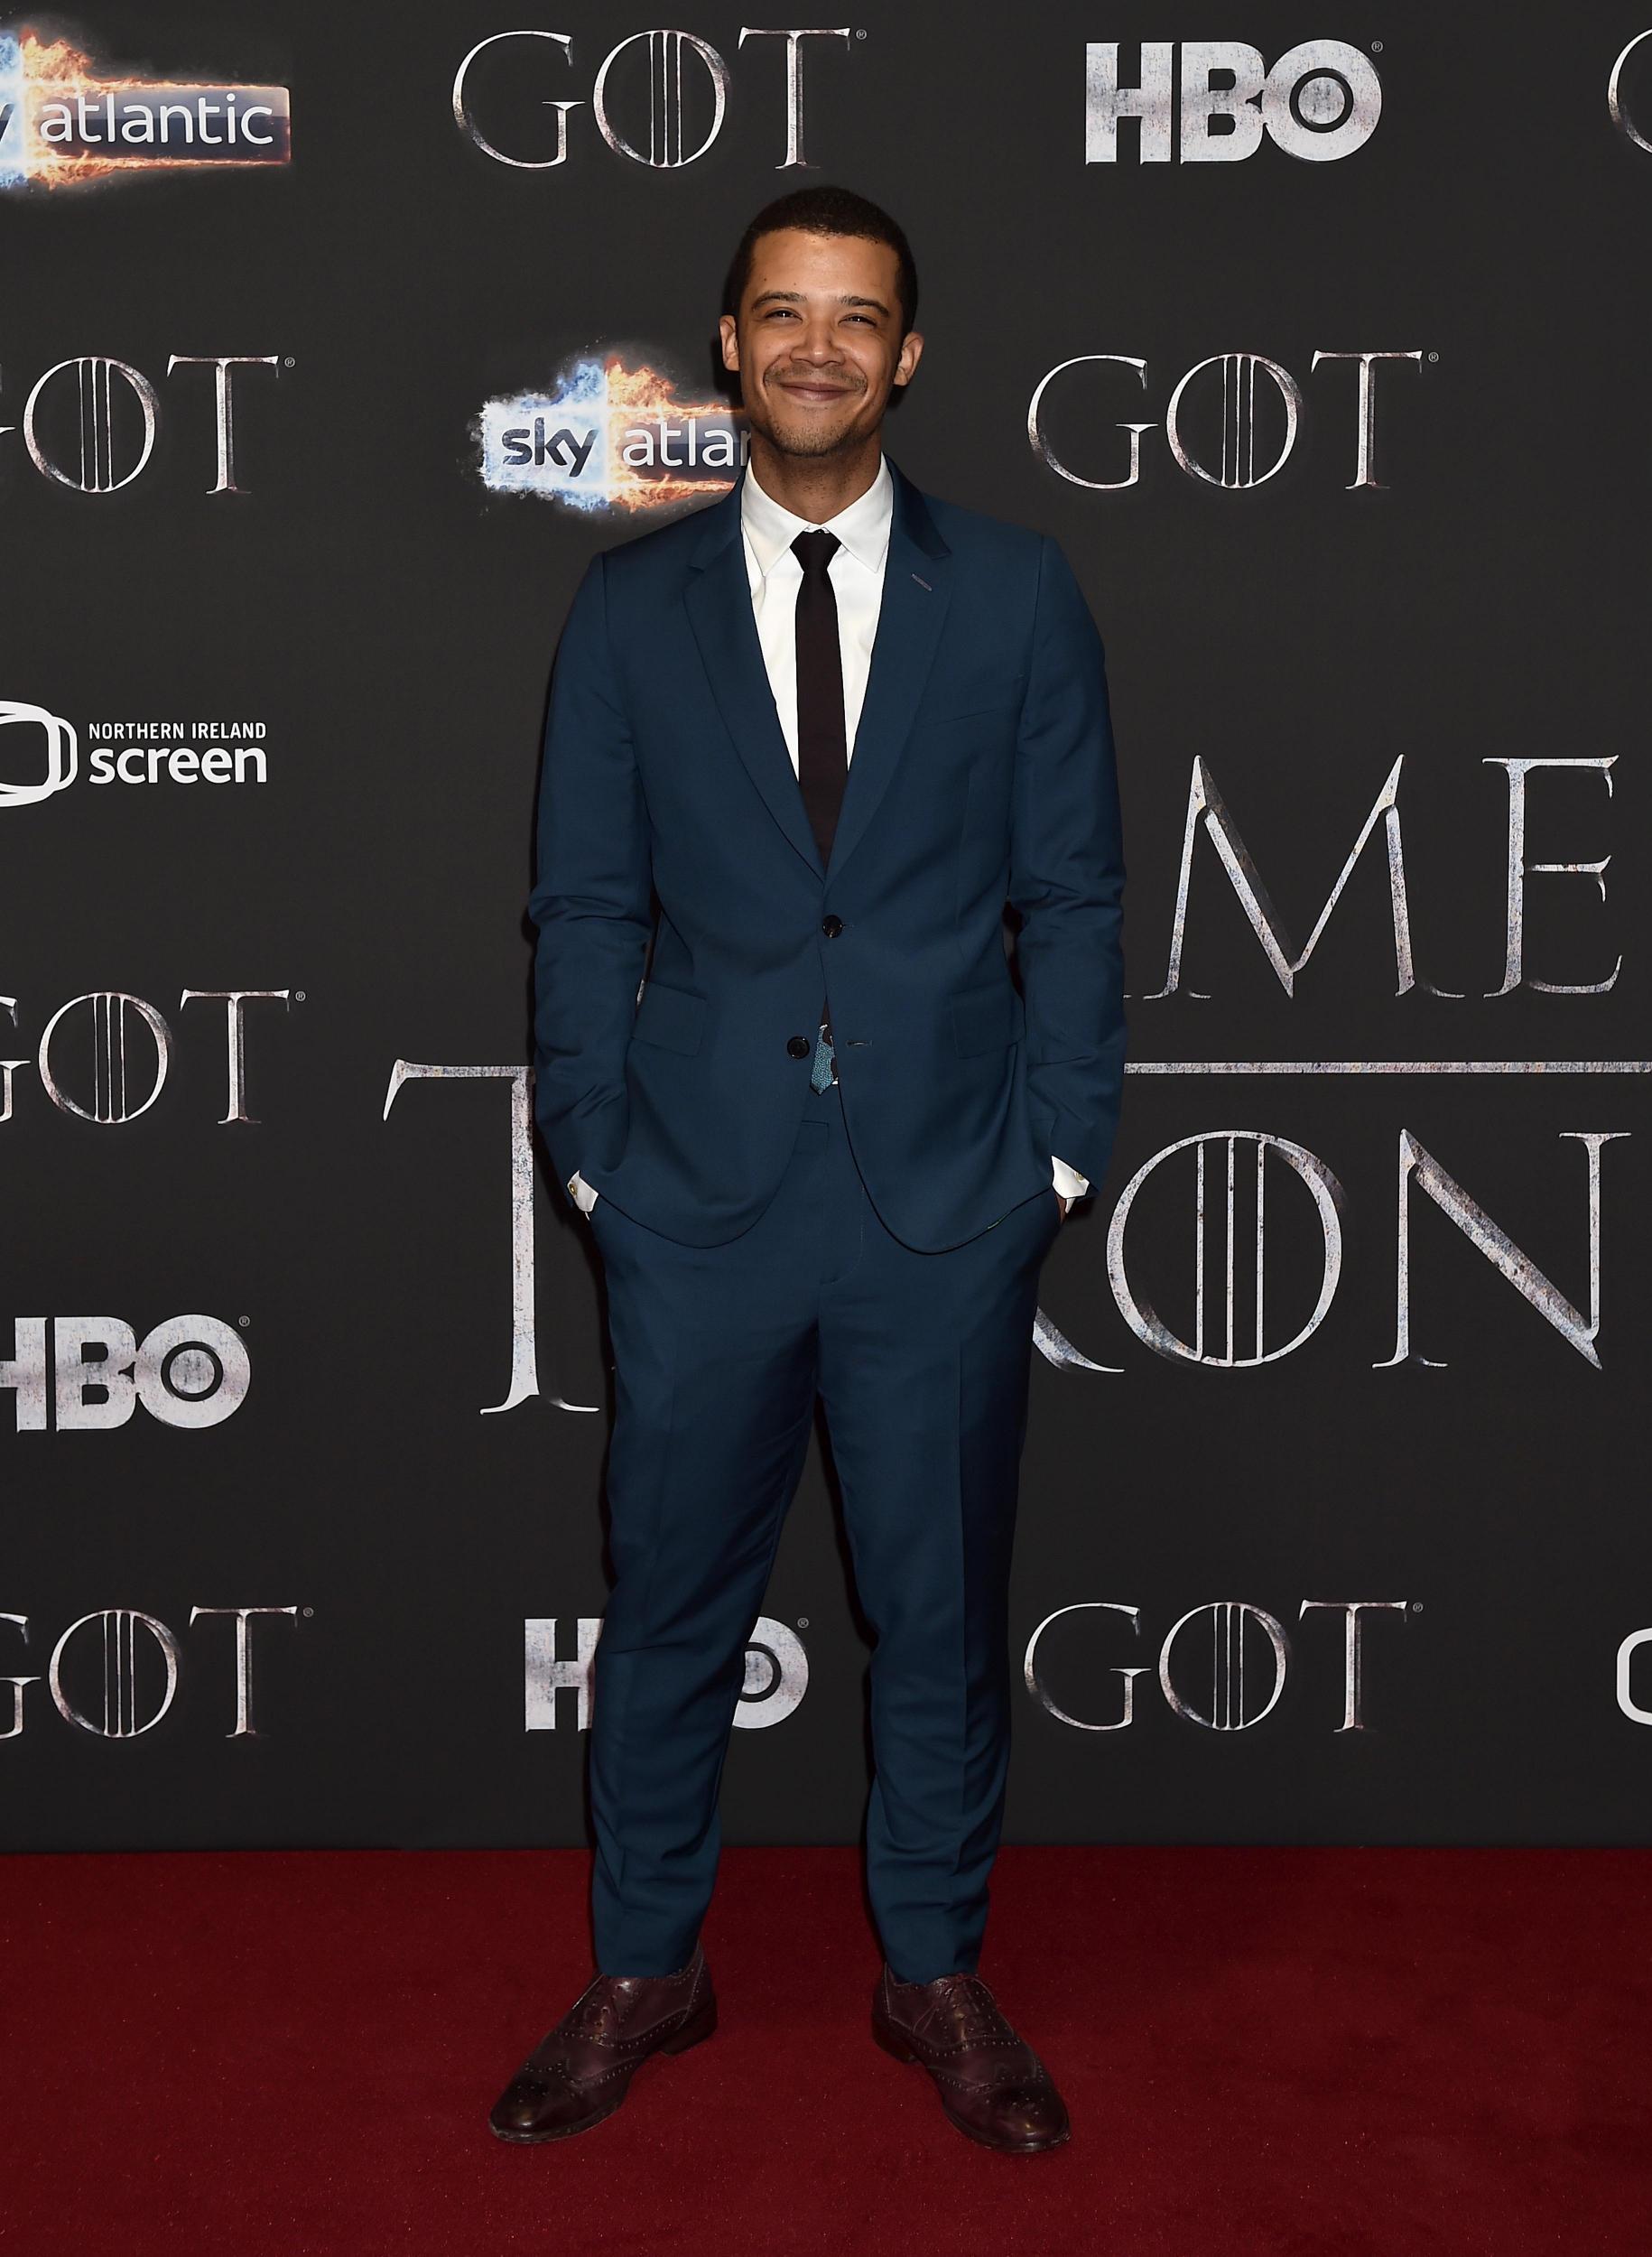 Game of Thrones season 8: Lena Headey was hesitant about